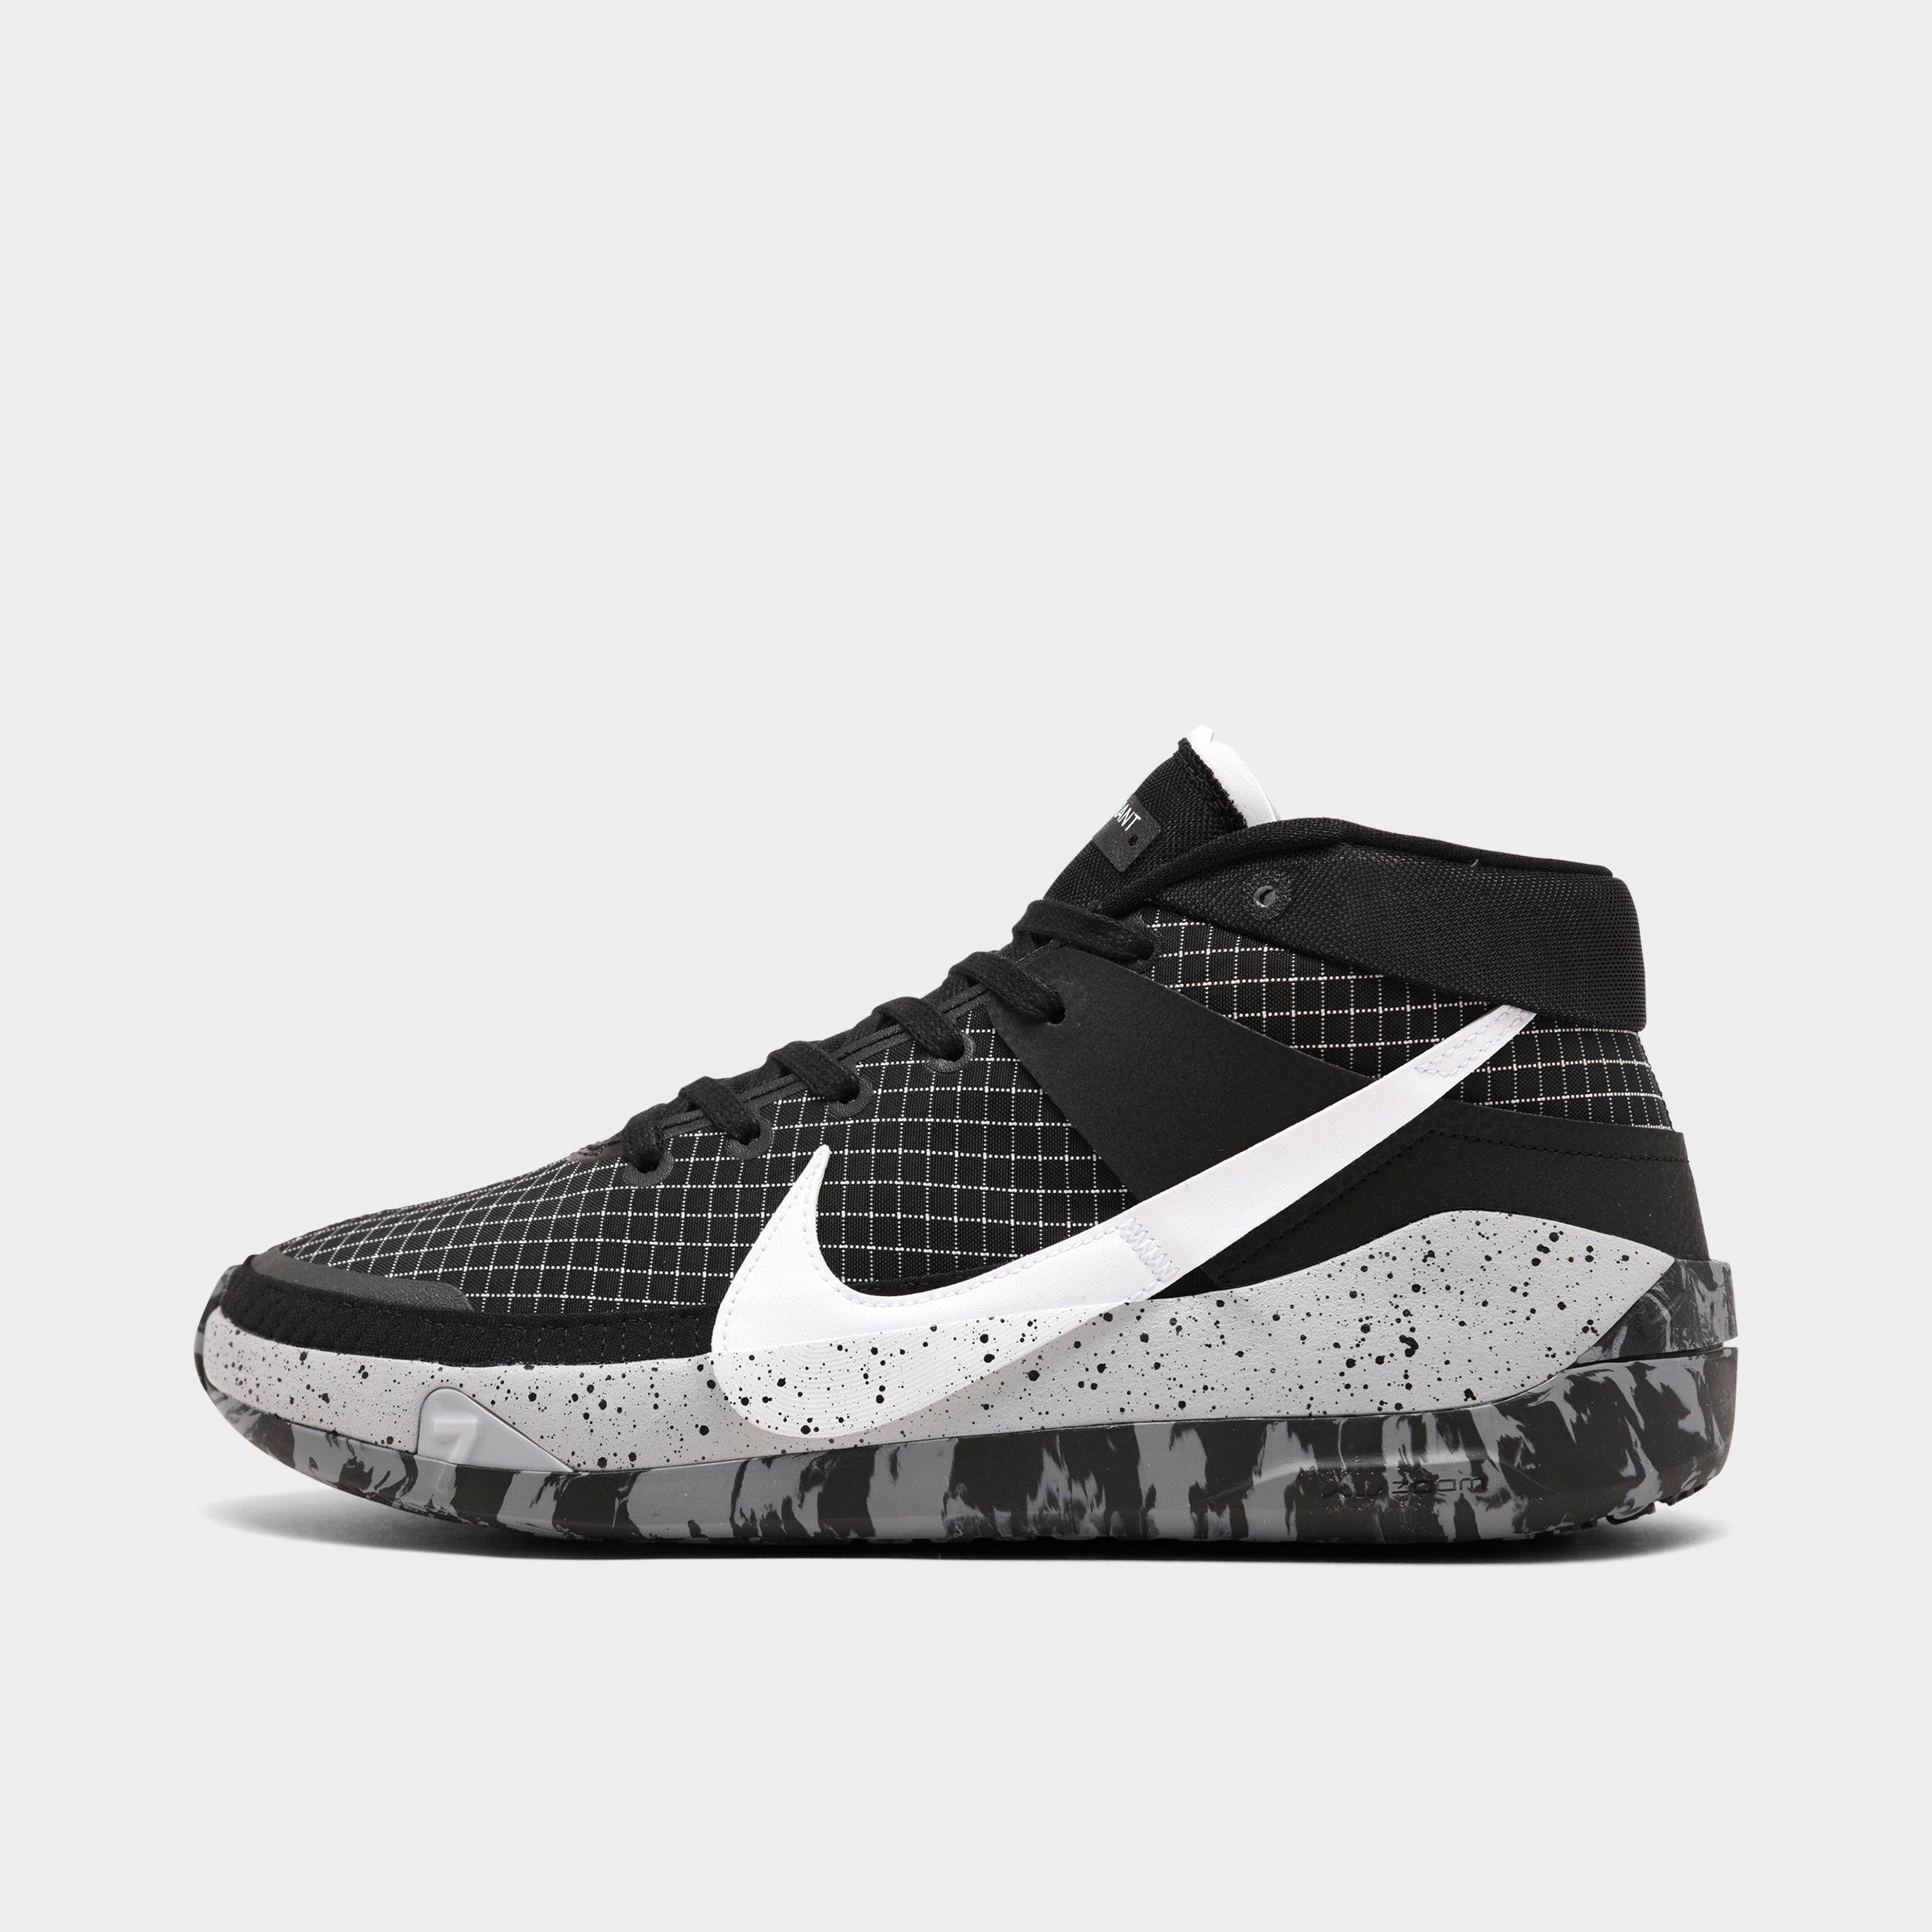 Nike Men's KD13 Basketball Shoes in Black Size 6.5   SportSpyder